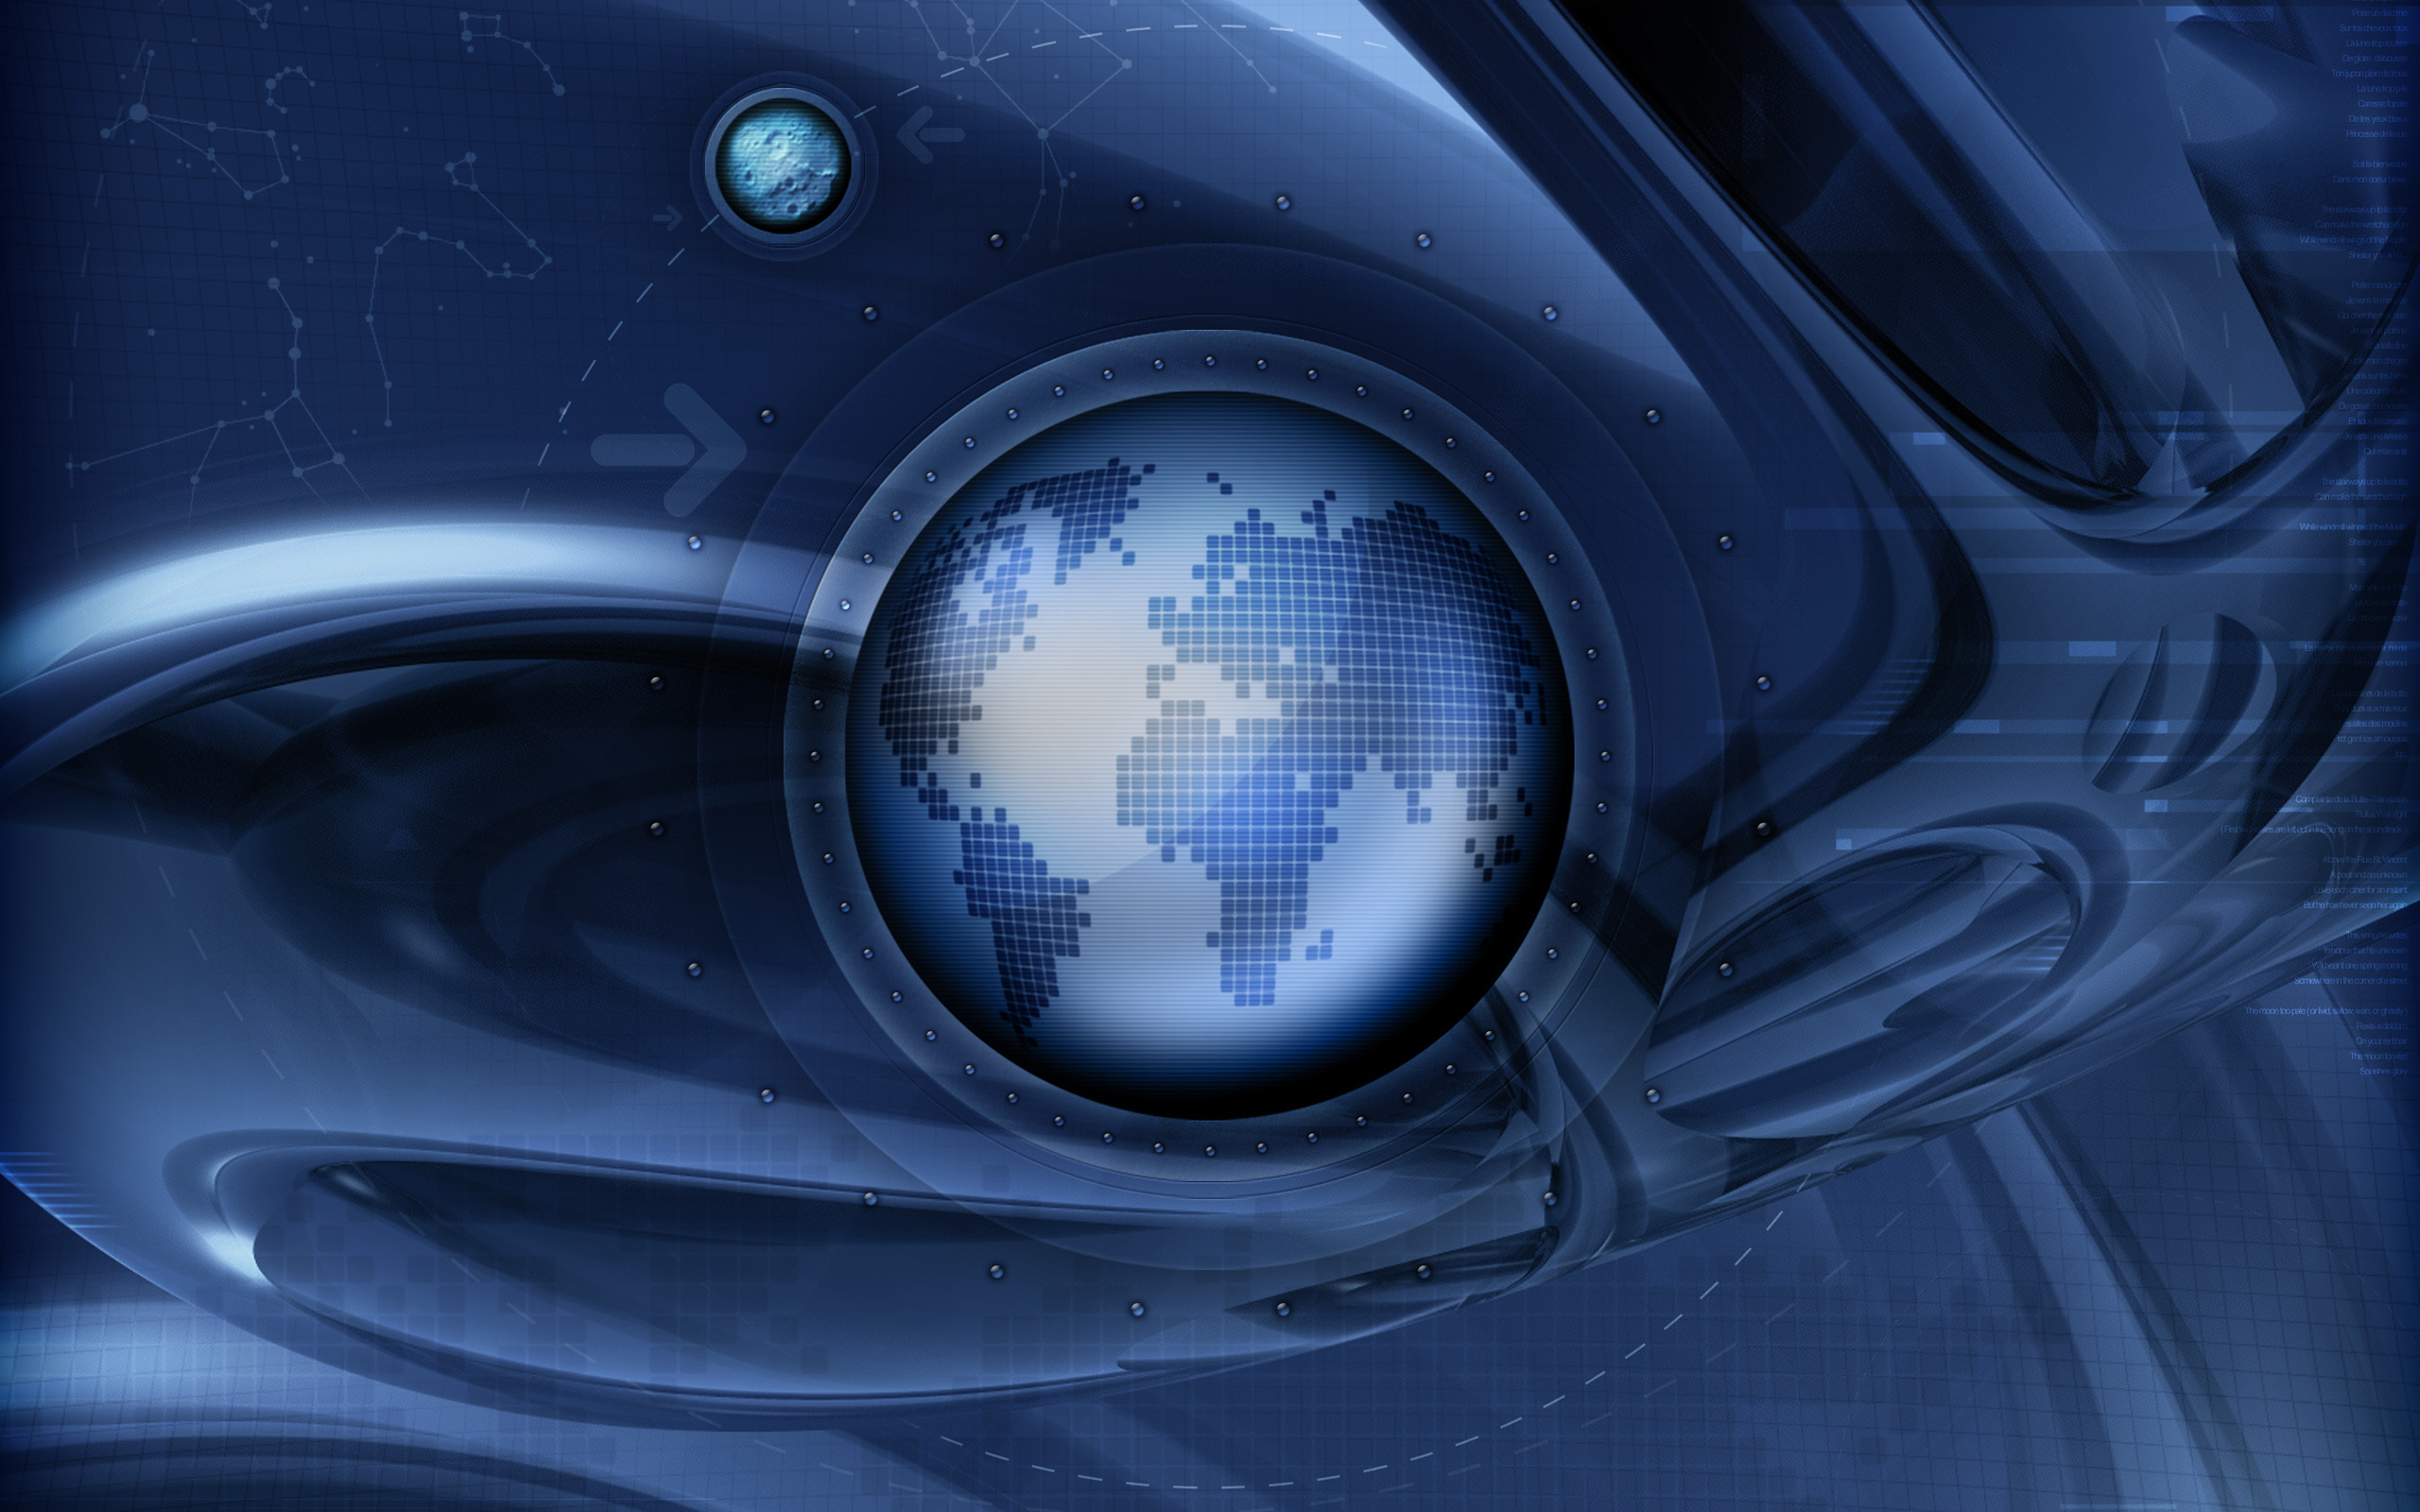 Digital World Wallpapers HD Wallpapers 2560x1600